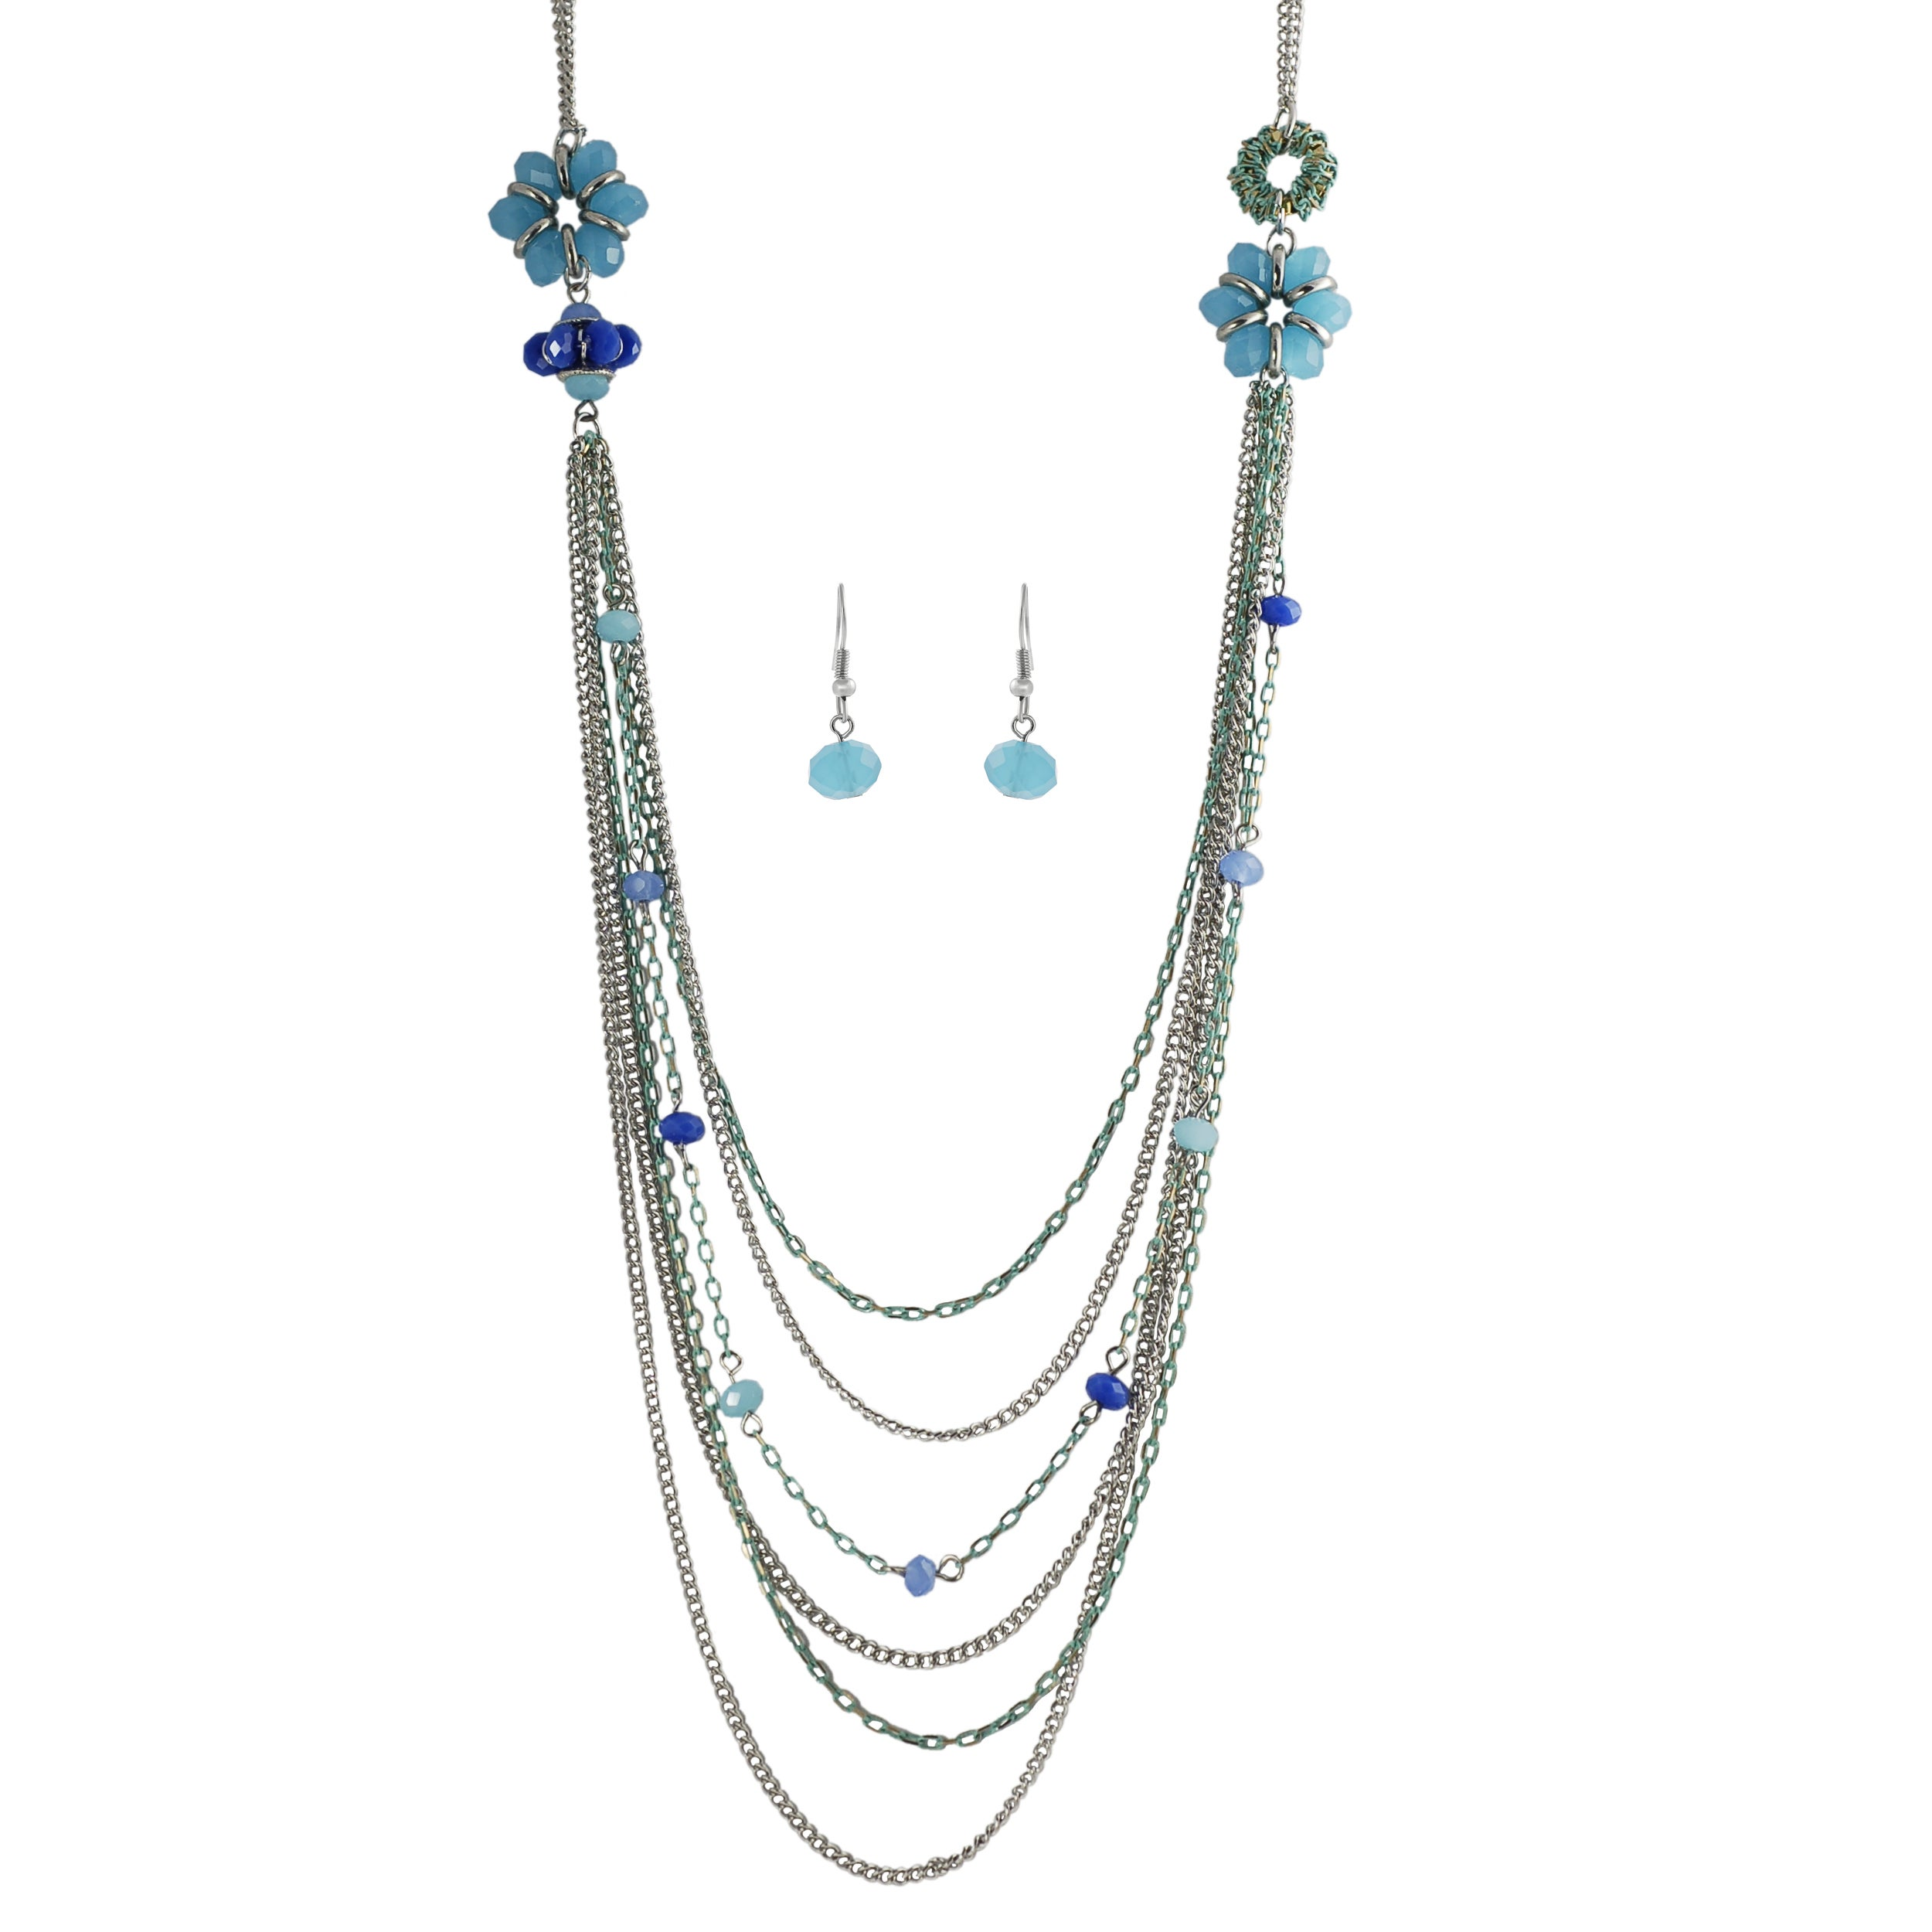 Journee Collection Silvertone Base Crystal Enamel Necklace Earring Set